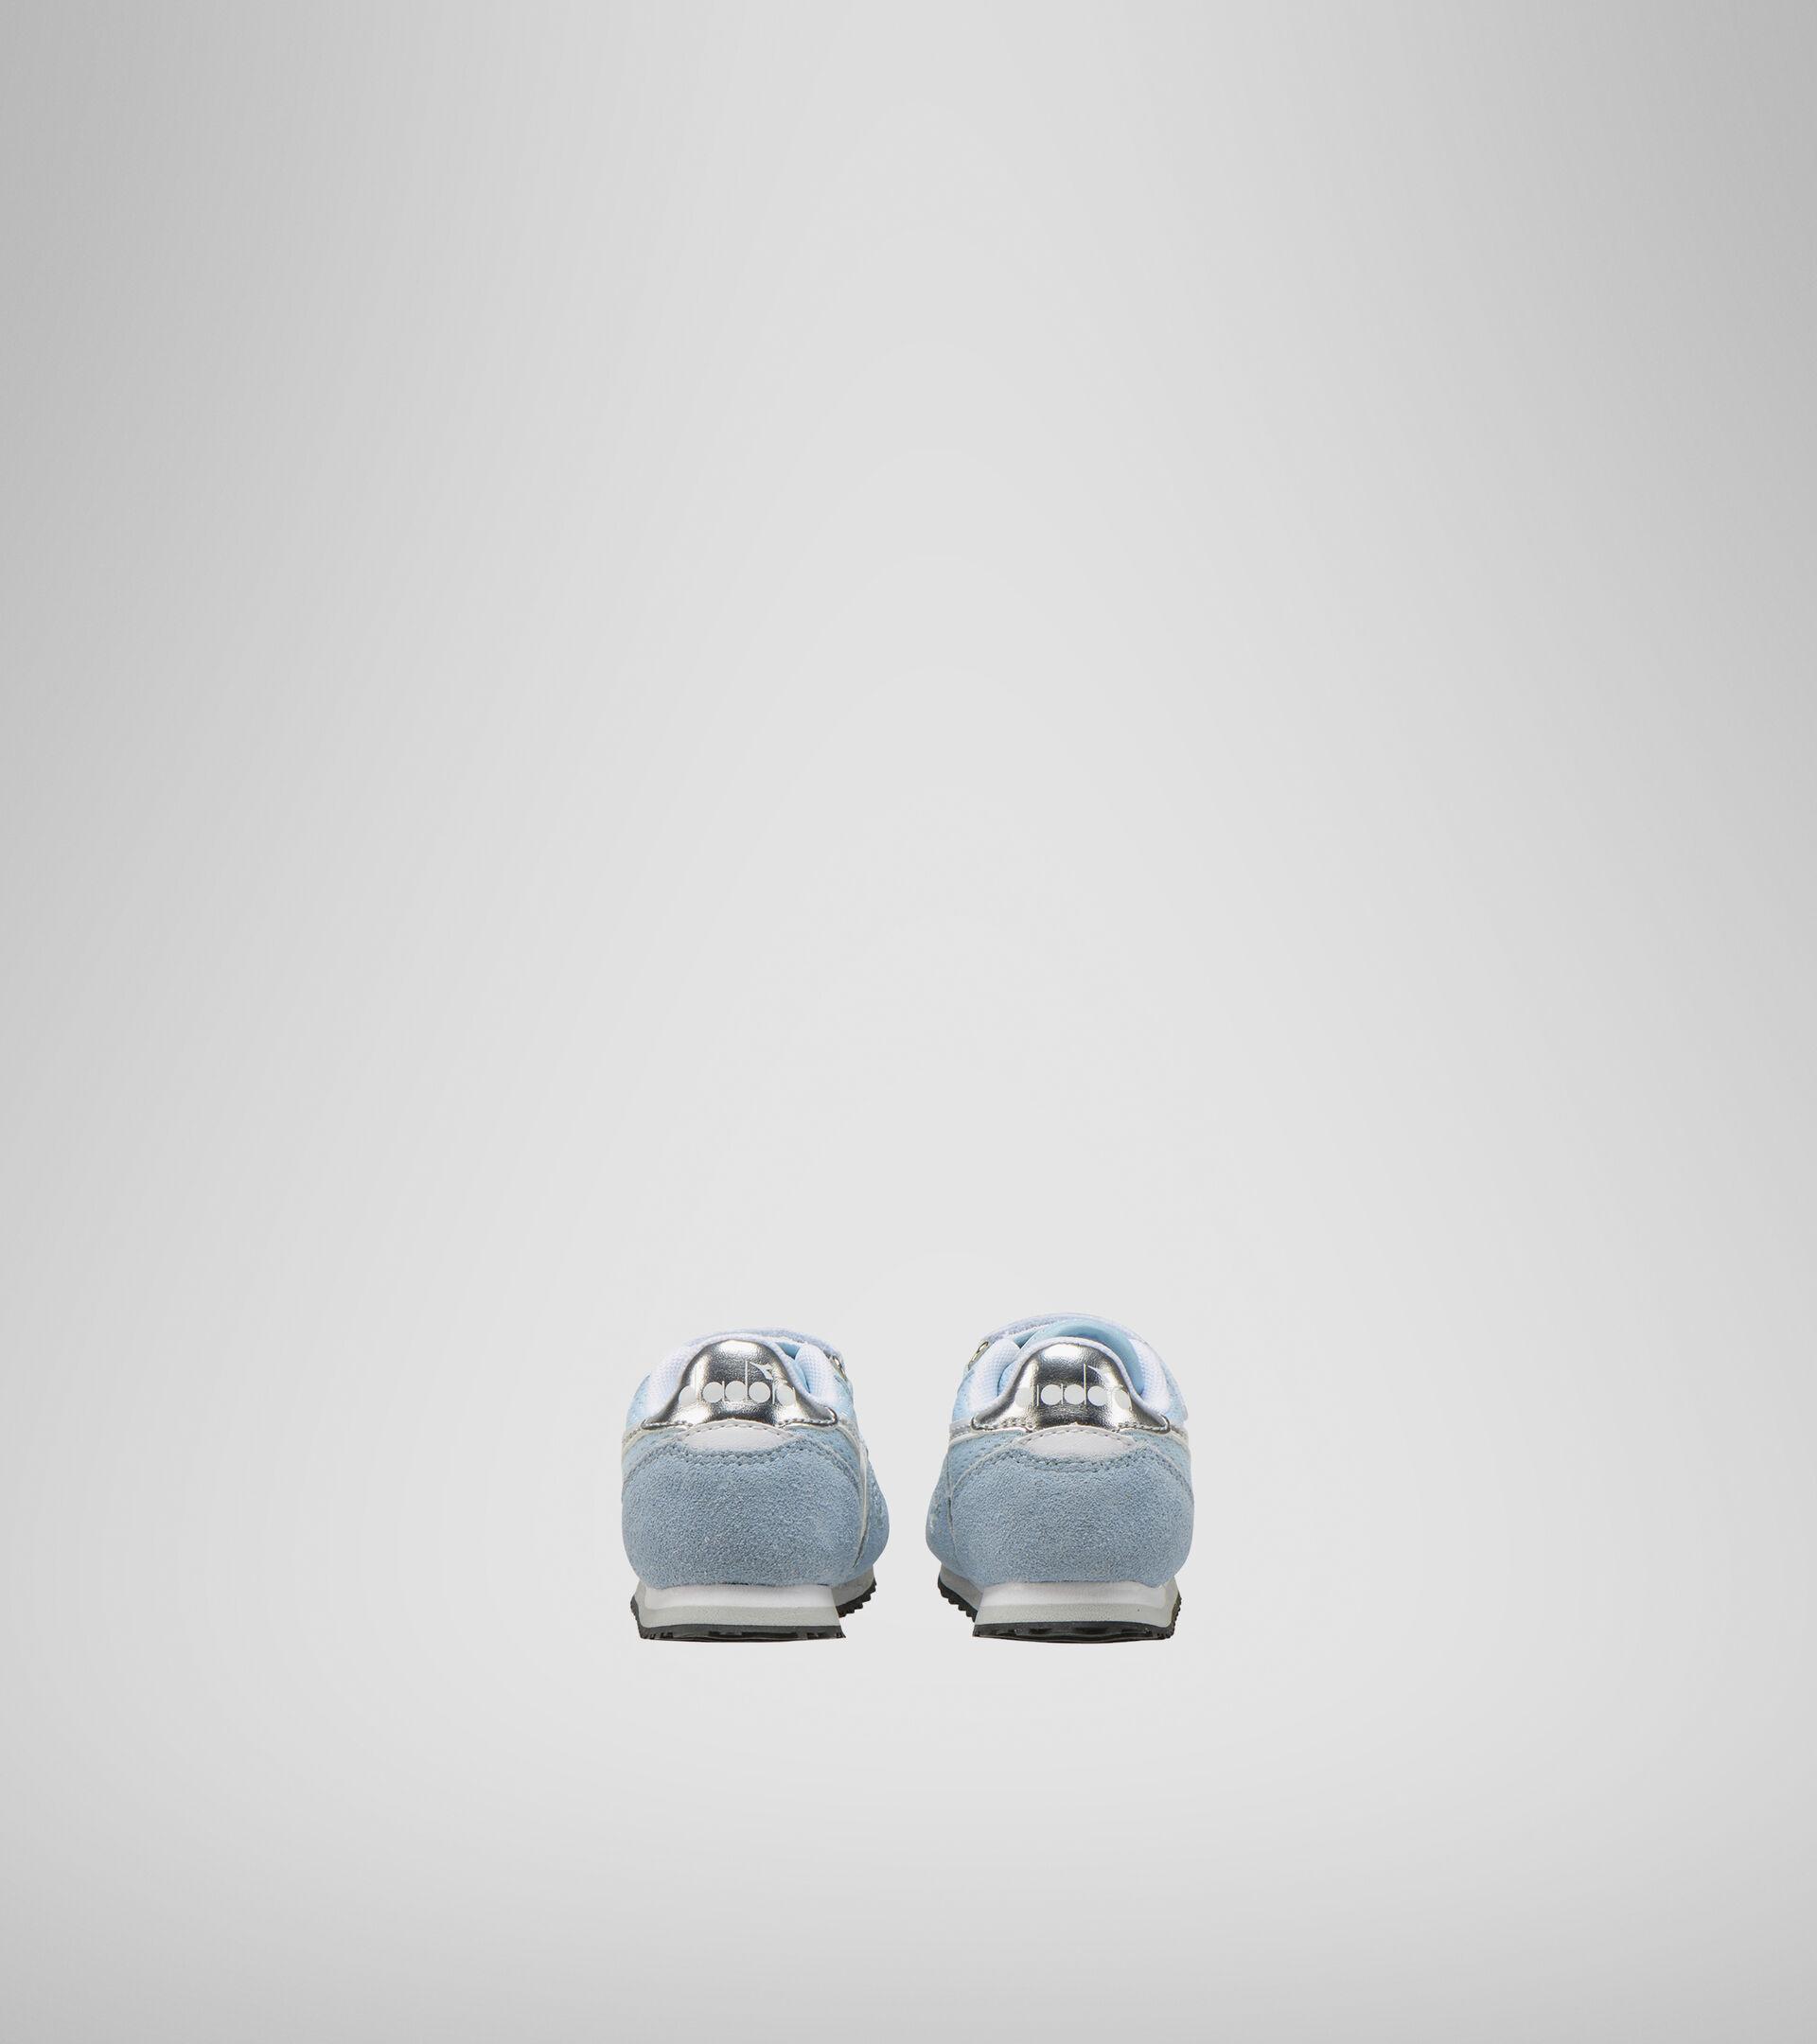 Footwear Sport BAMBINO SIMPLE RUN TD GIRL AZUL LUZ DE LA ESTRELLAS Diadora